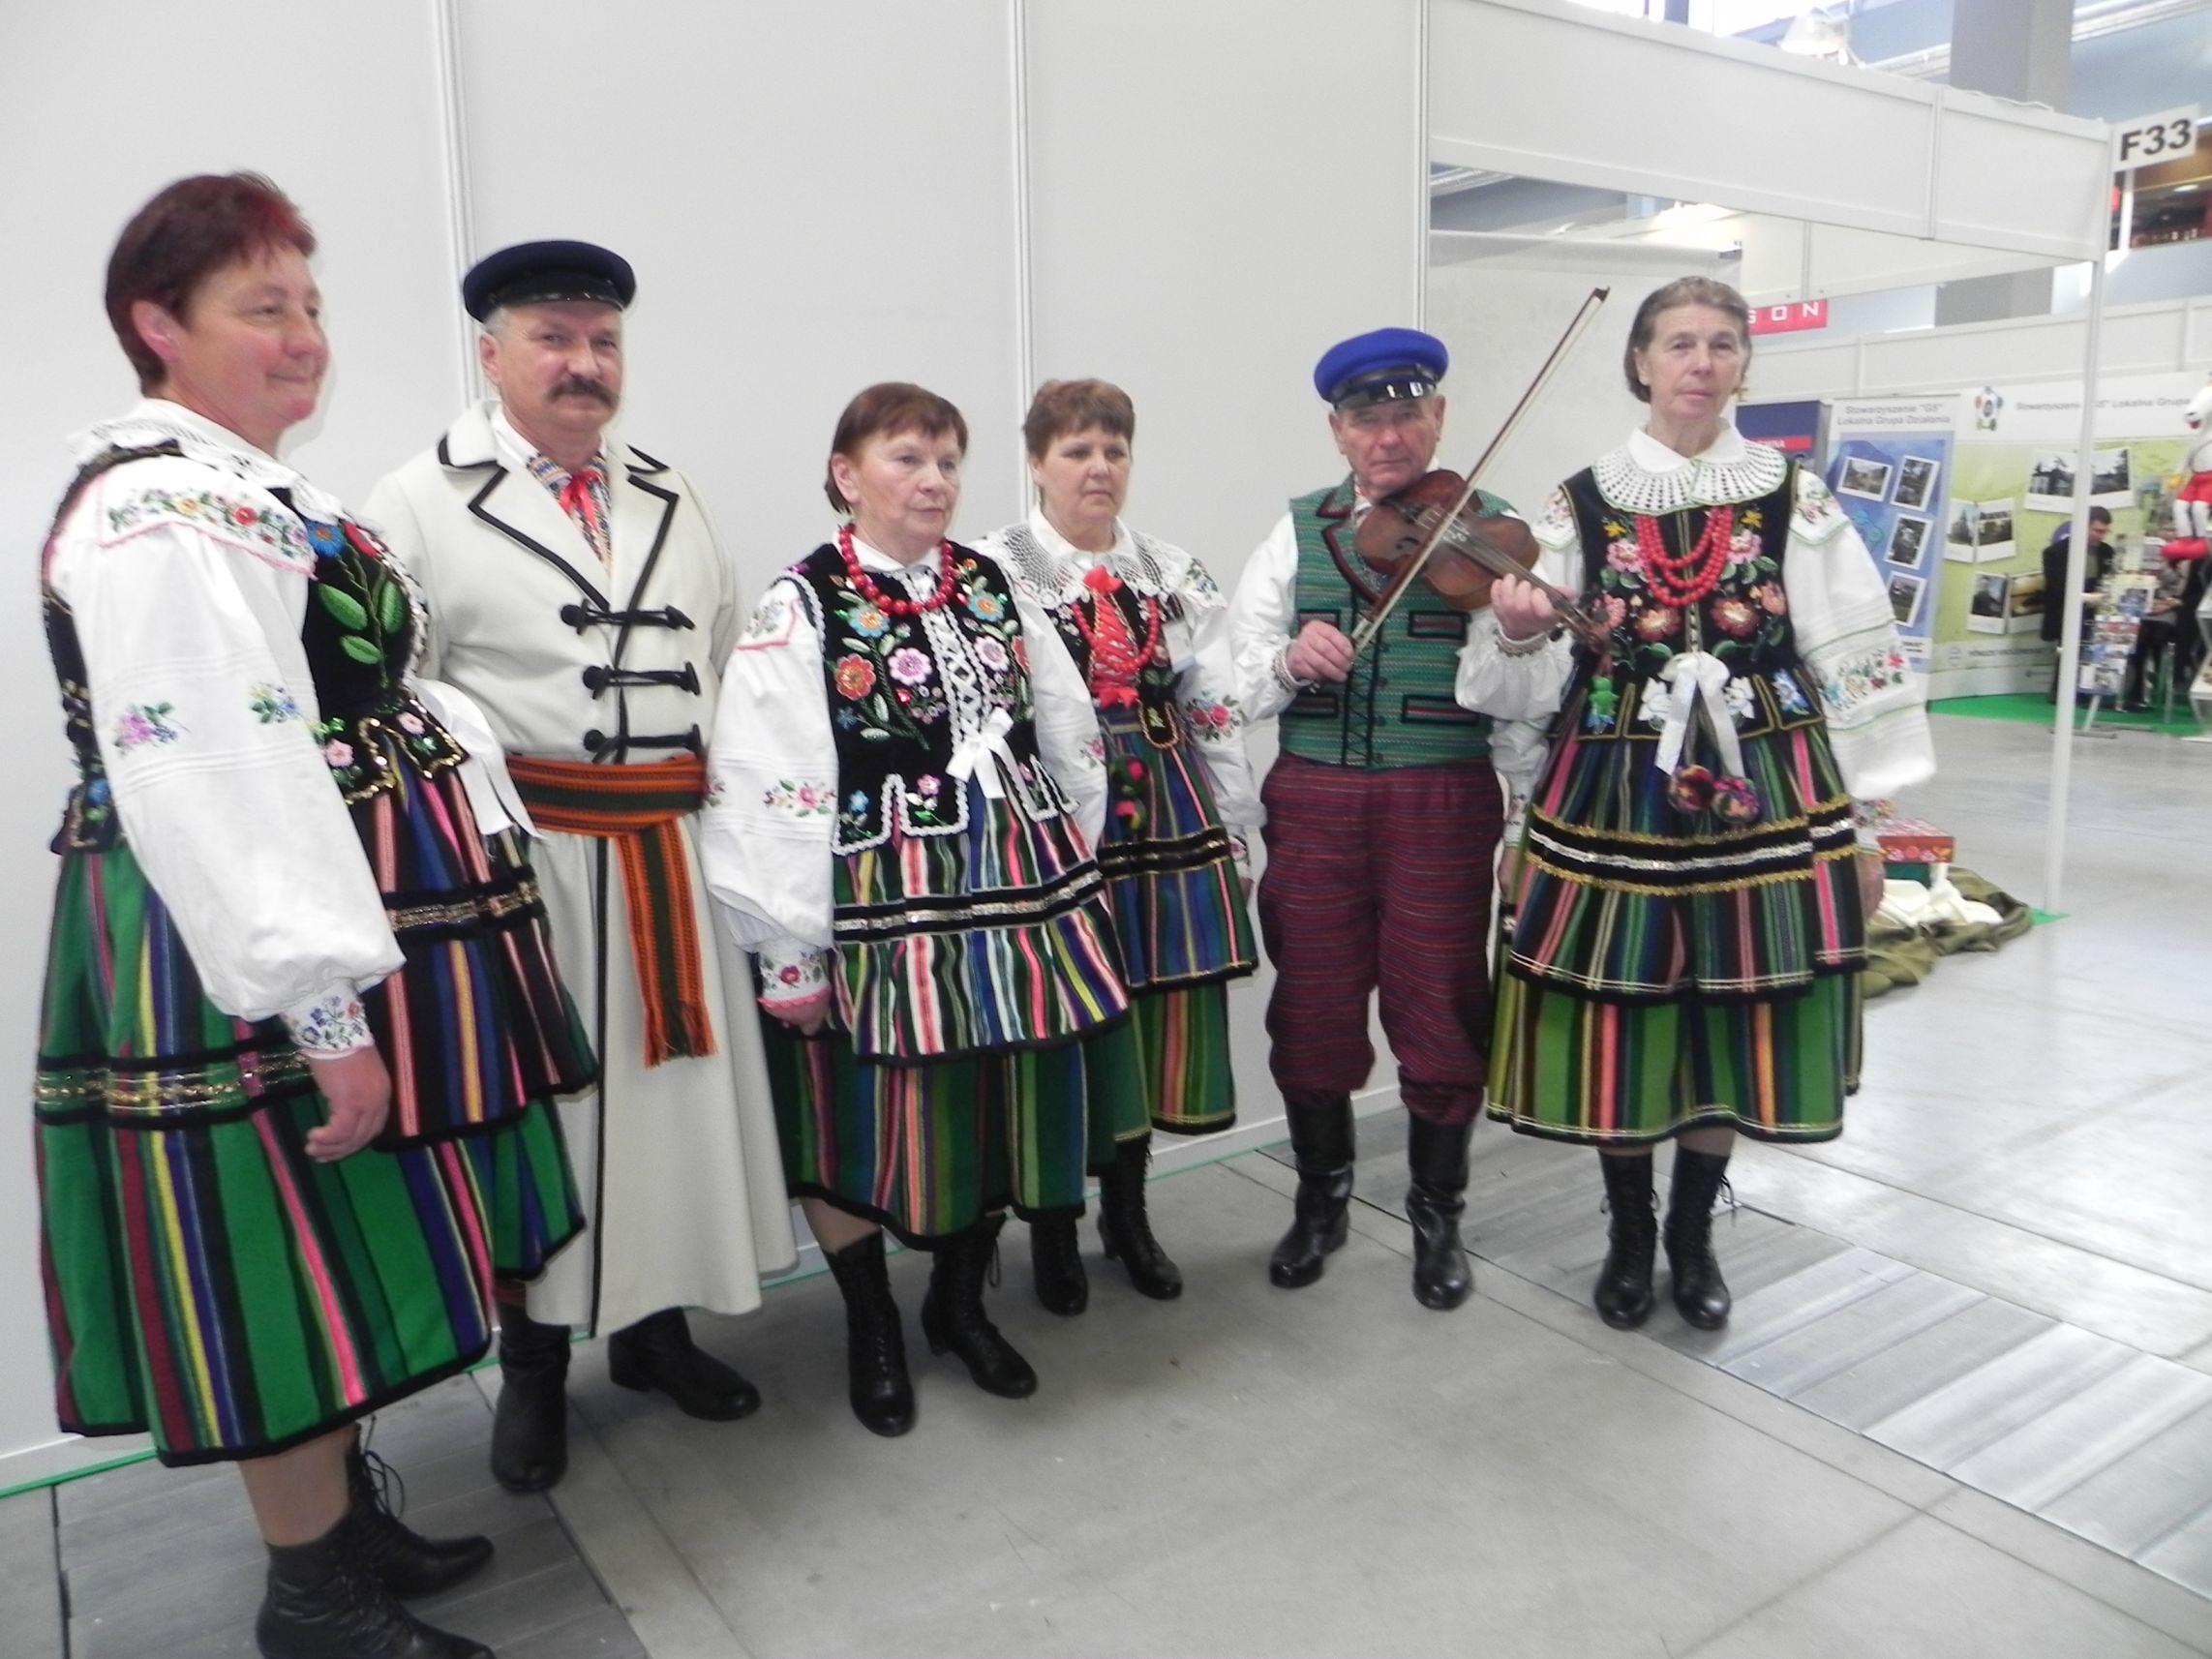 Agrotravel - Kielce (73)